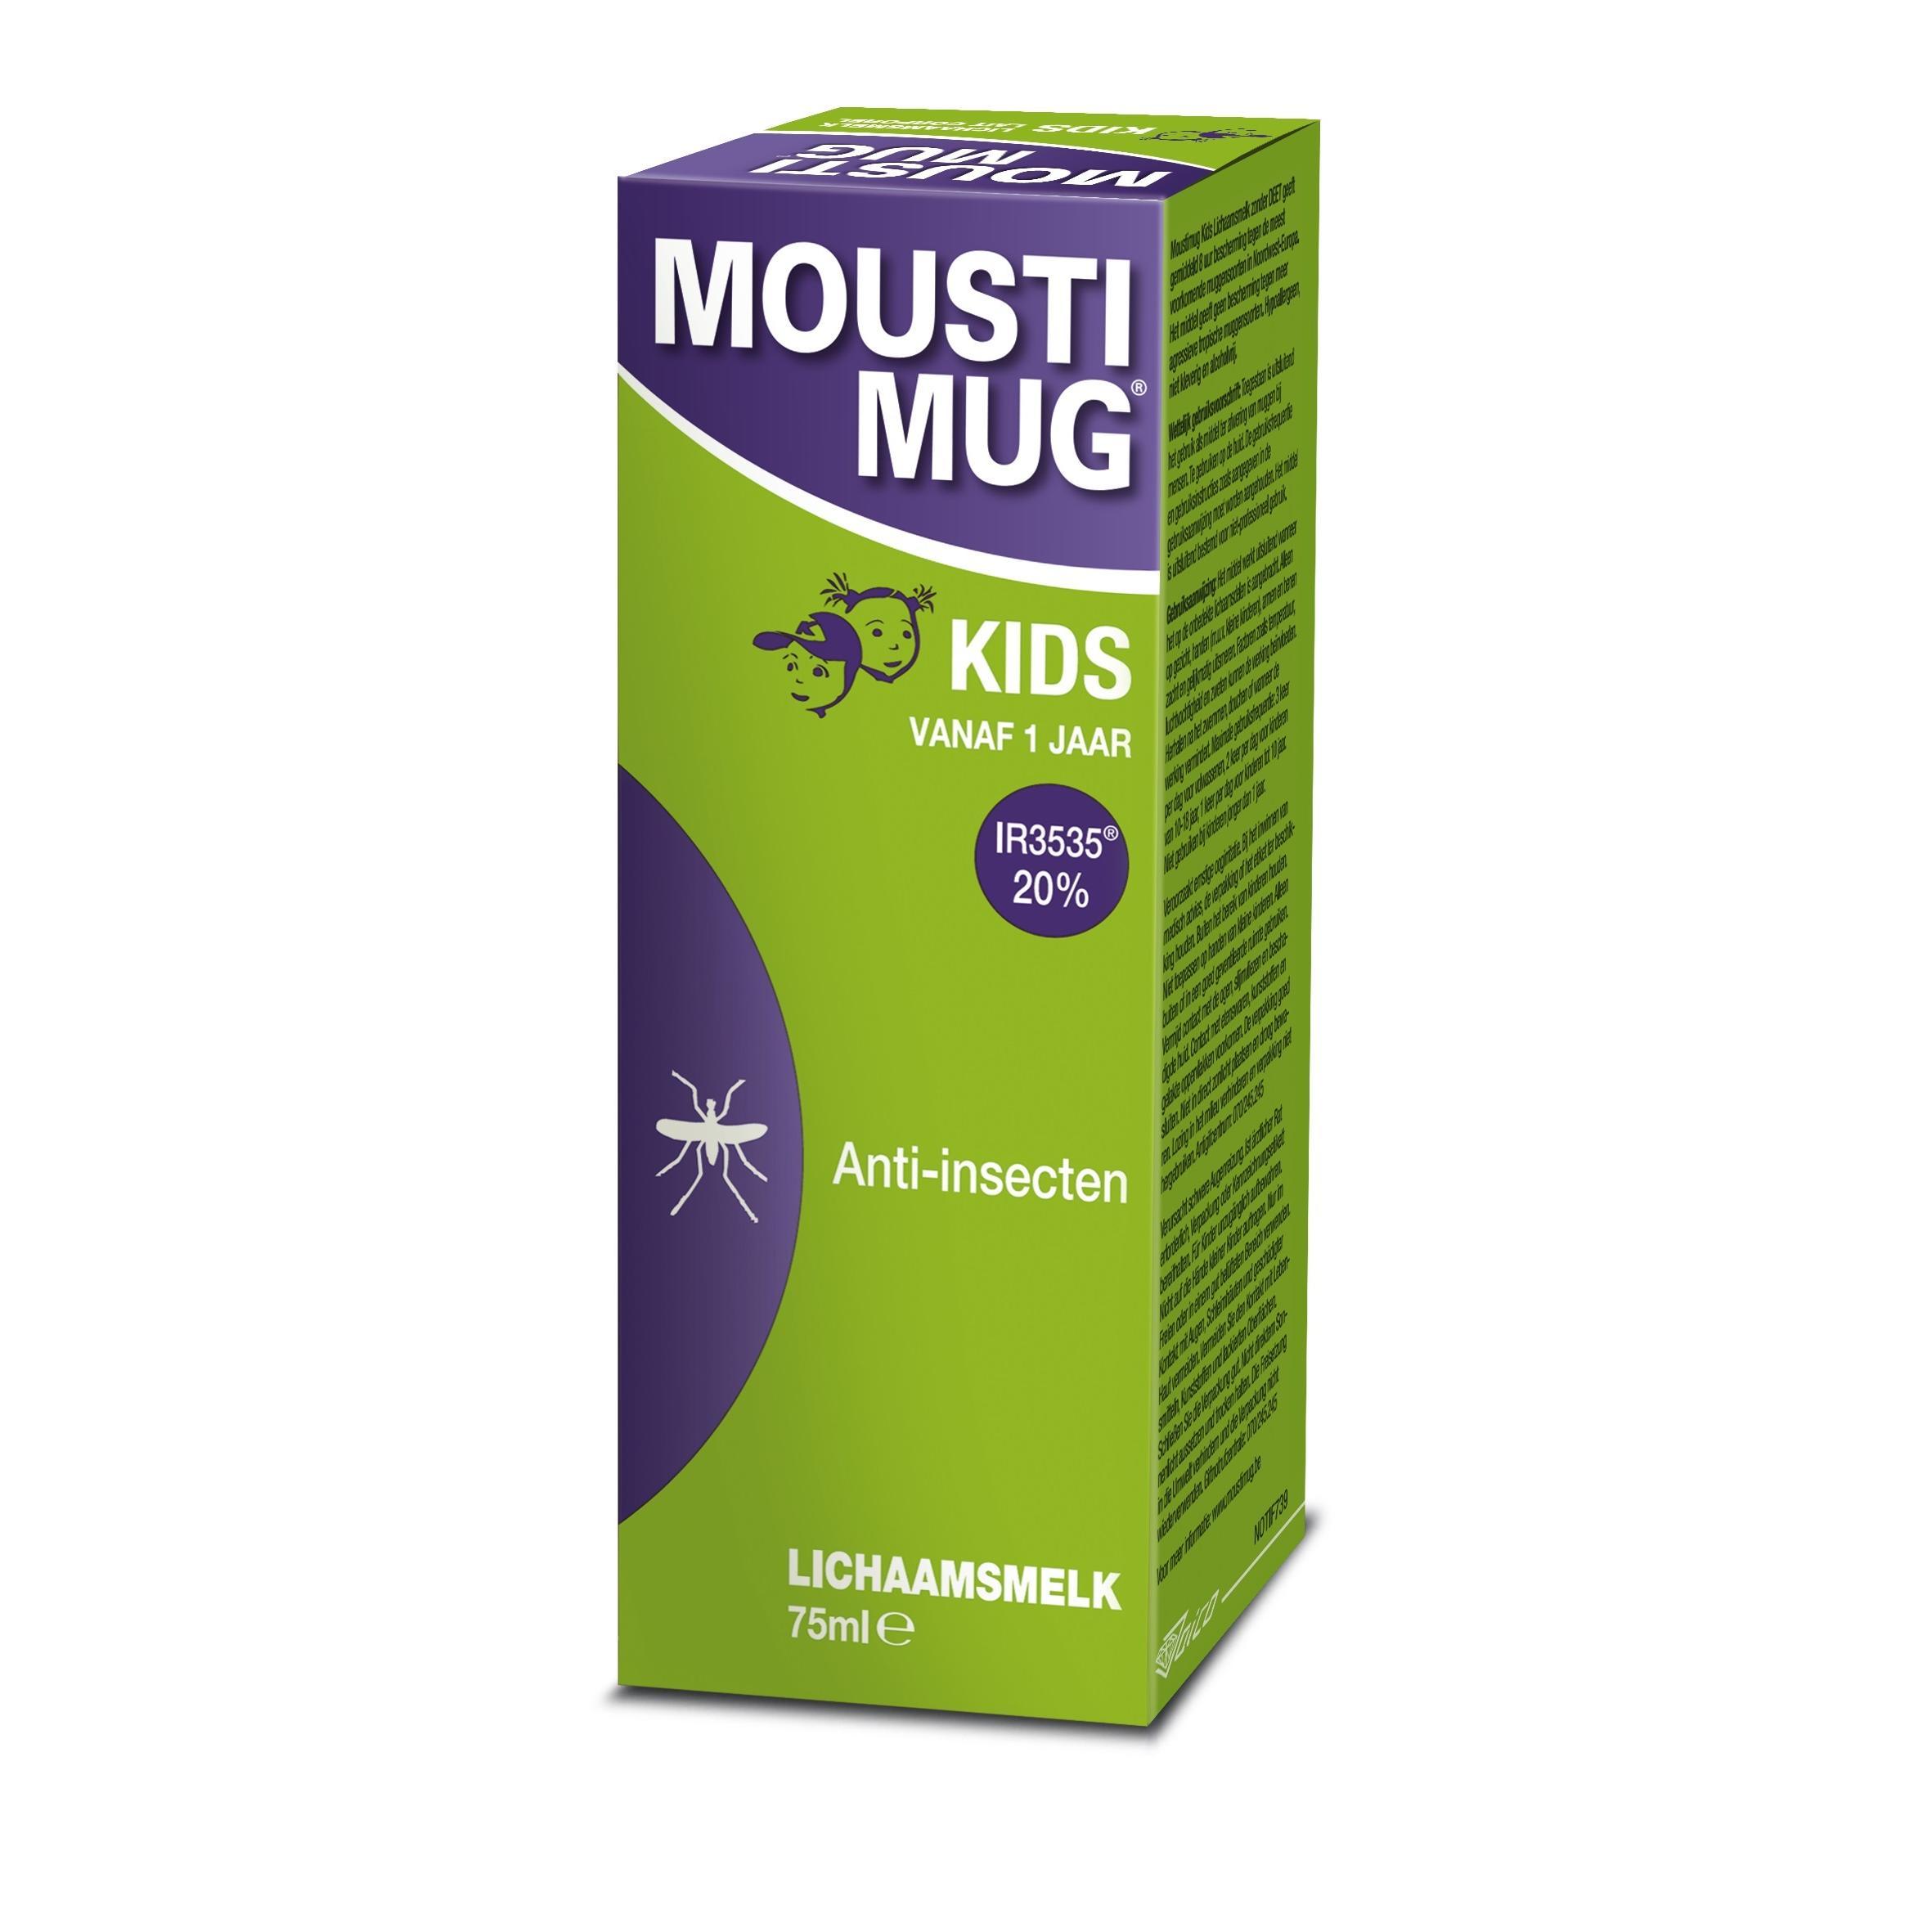 Image of Moustimug kids lait corporel